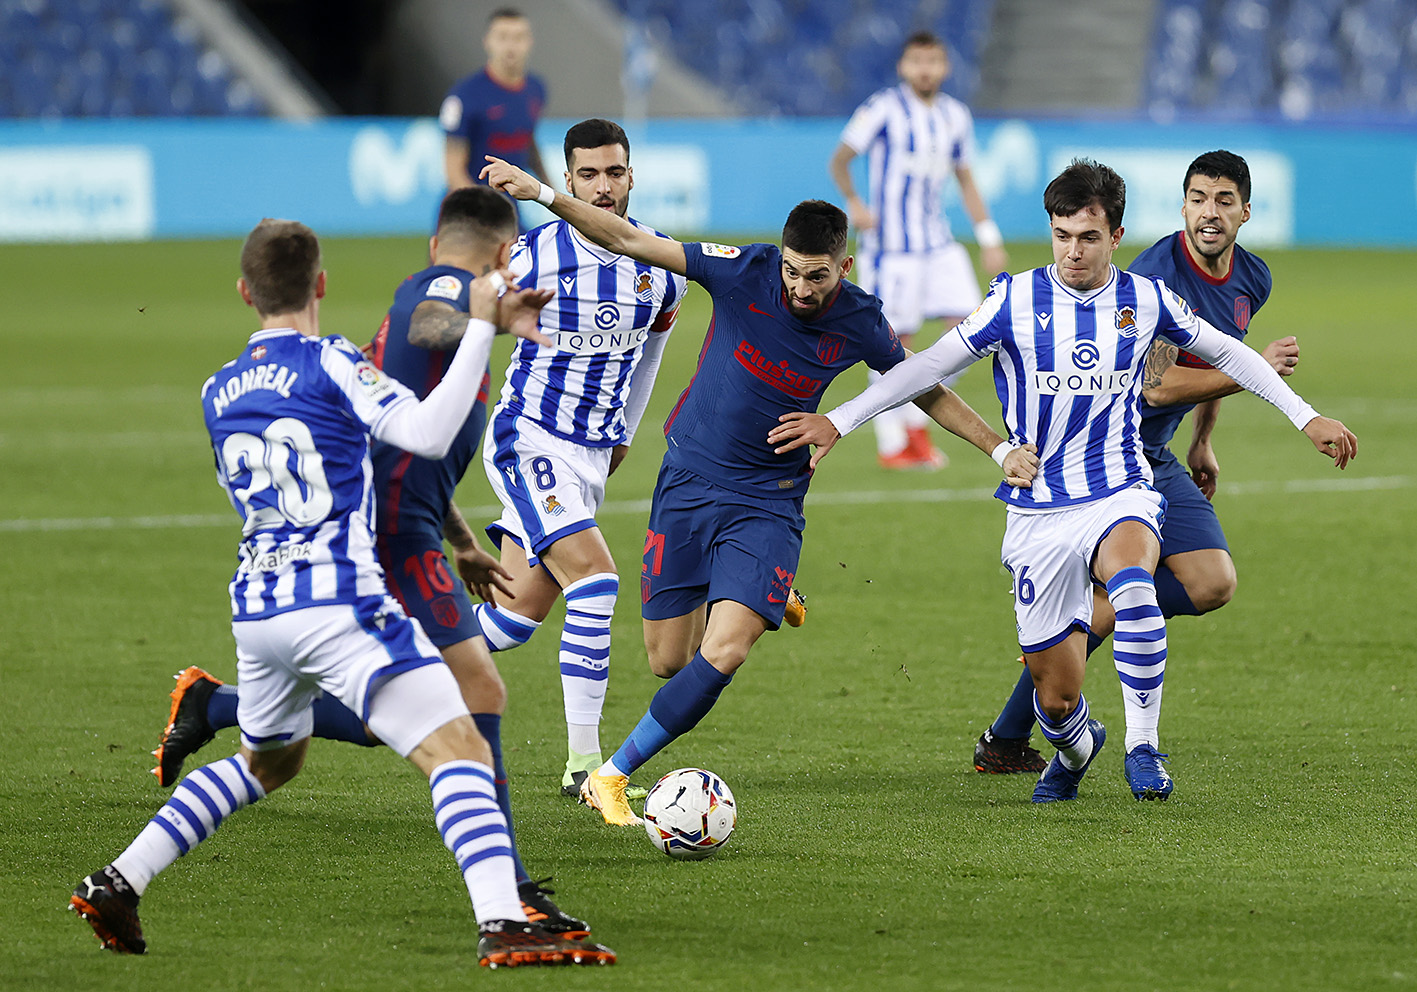 Watch: Mario Hermoso gives Atletico Madrid the lead at Real Sociedad